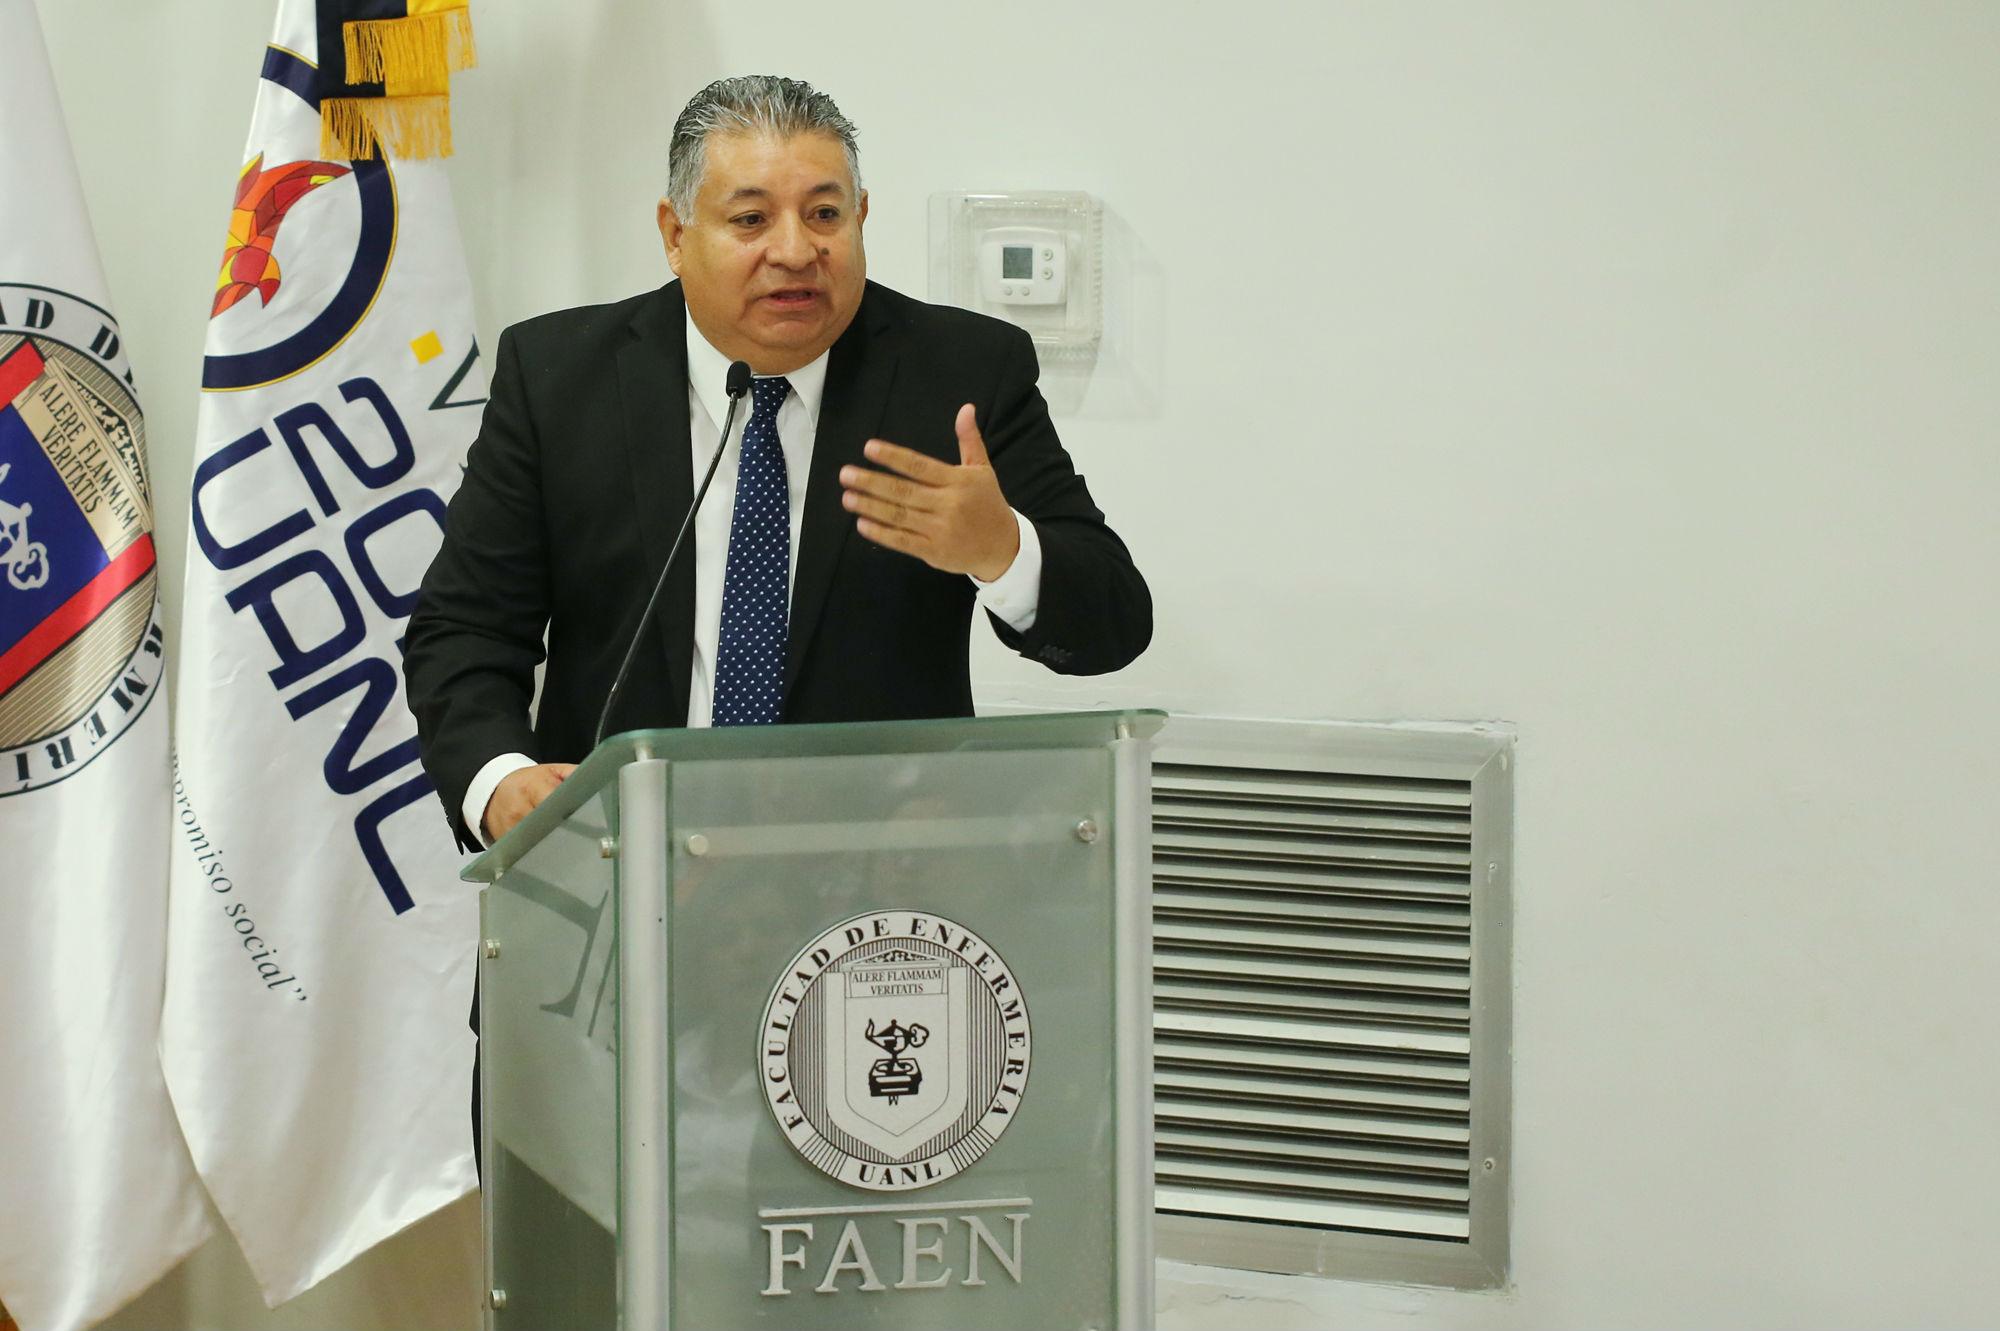 Donato Vallín González, Director General de GRANA